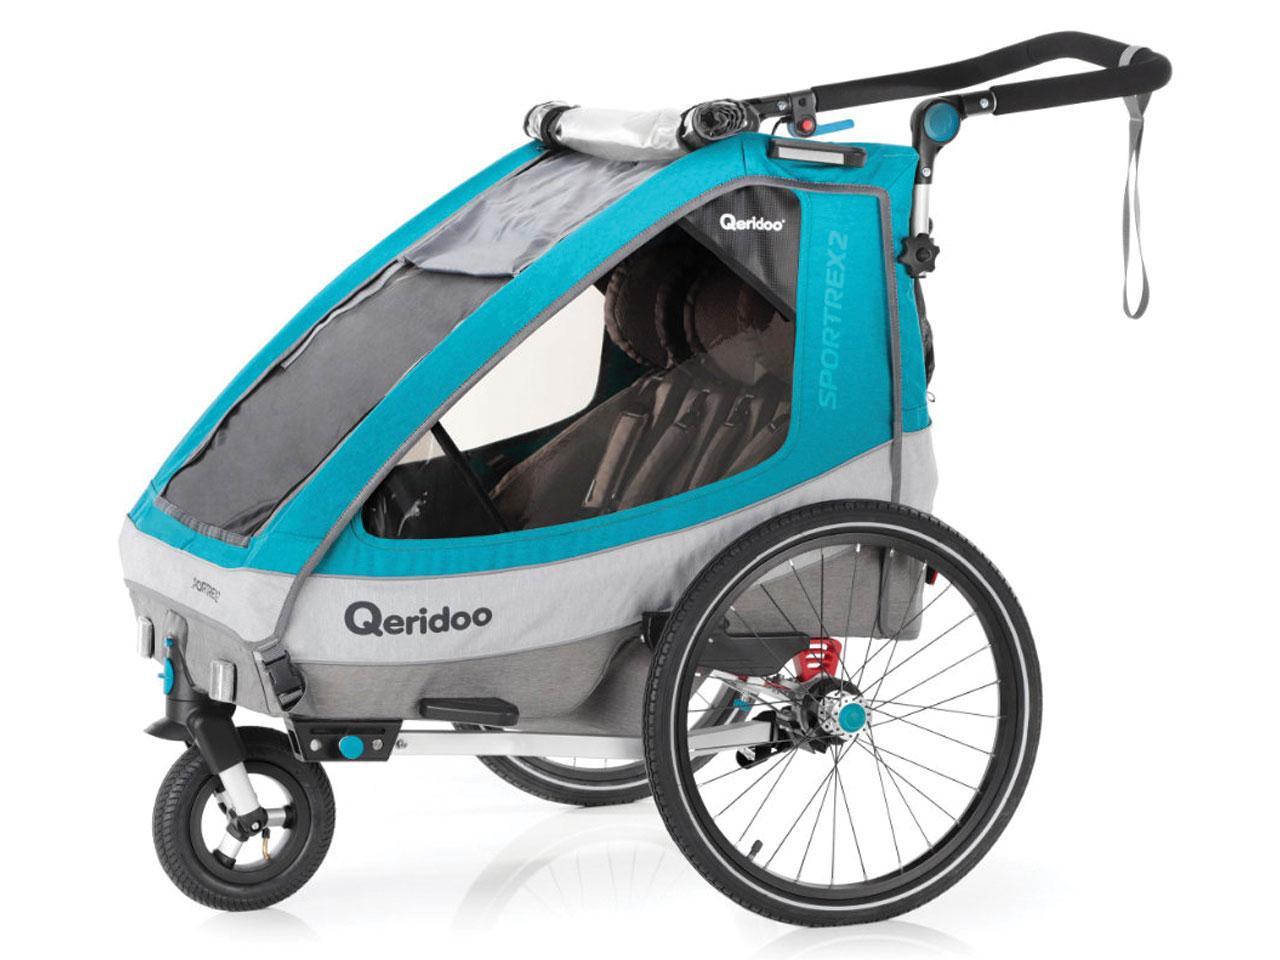 Cyklistický vozík QERIDOO Sportrex 2 2020 + AKCE CASHBACK 10%